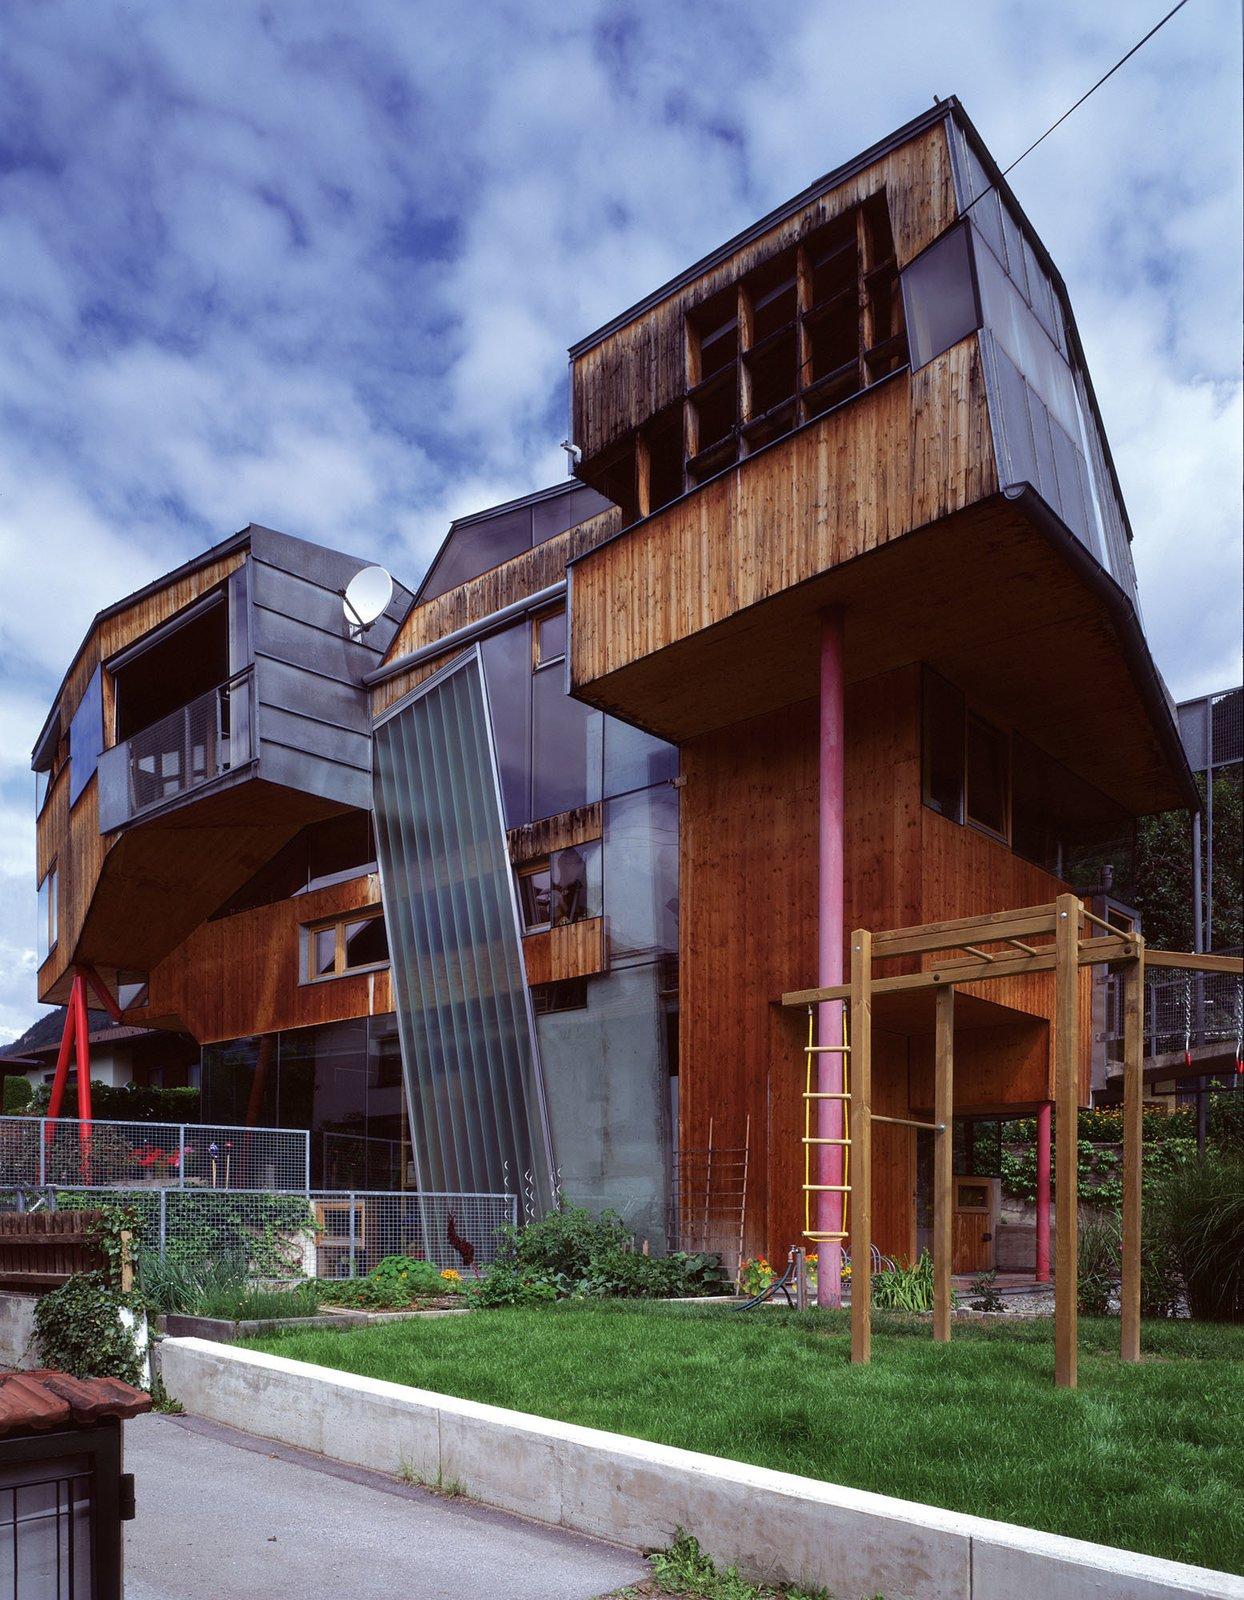 Zirl House  Zirl House by Marie-Therese Harnoncourt-Fuchs